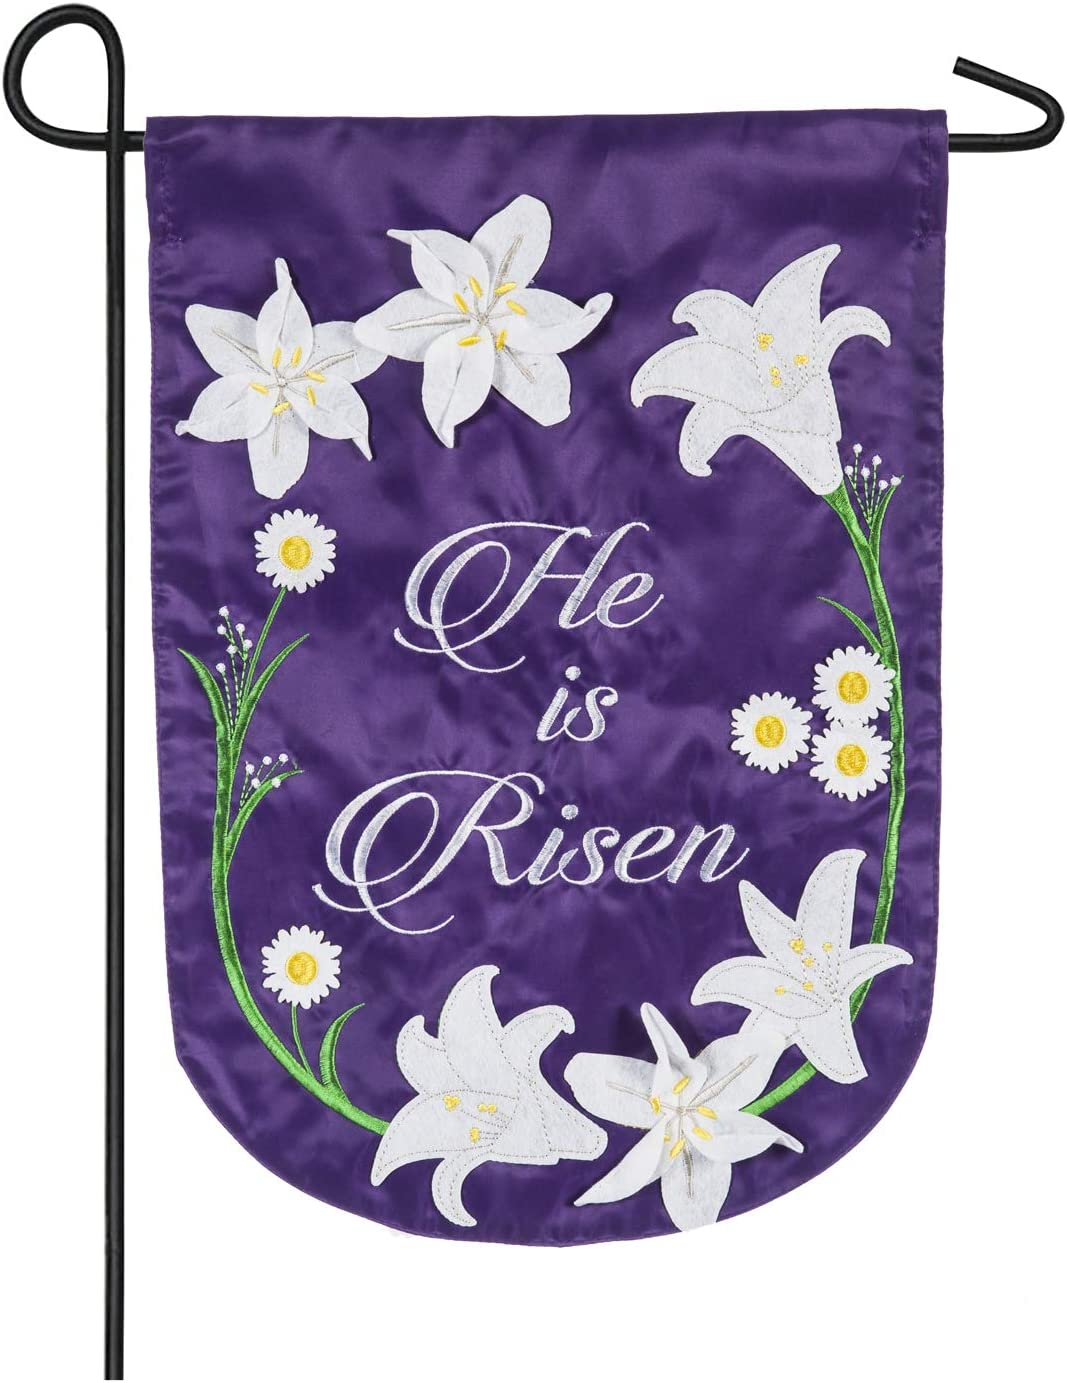 Easter Lily Garden Applique Flag - 13 x 1 x 18 Inches